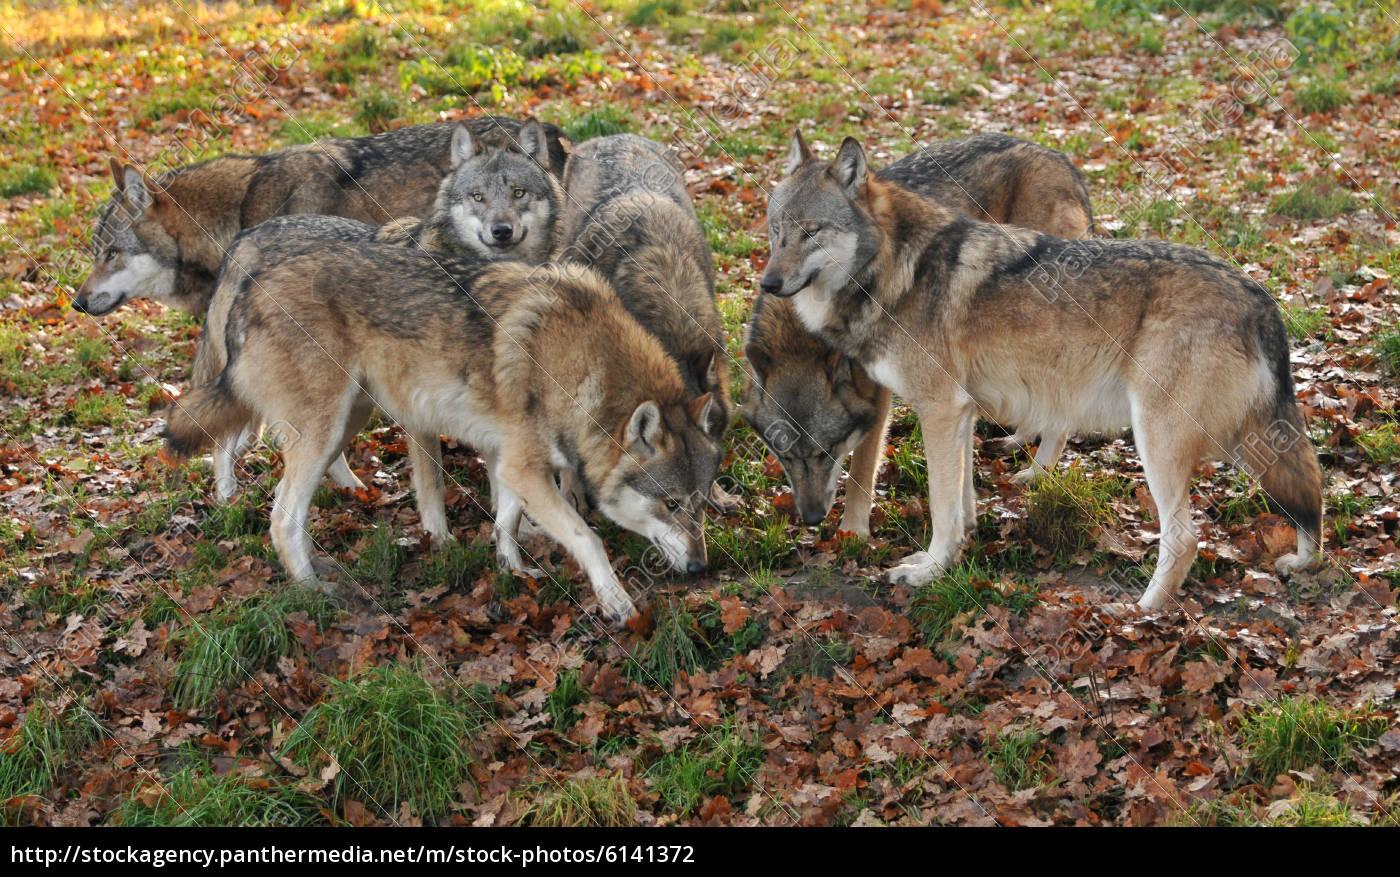 Wolfsrudel - Lizenzfreies Foto - #6141372 - Bildagentur PantherMedia